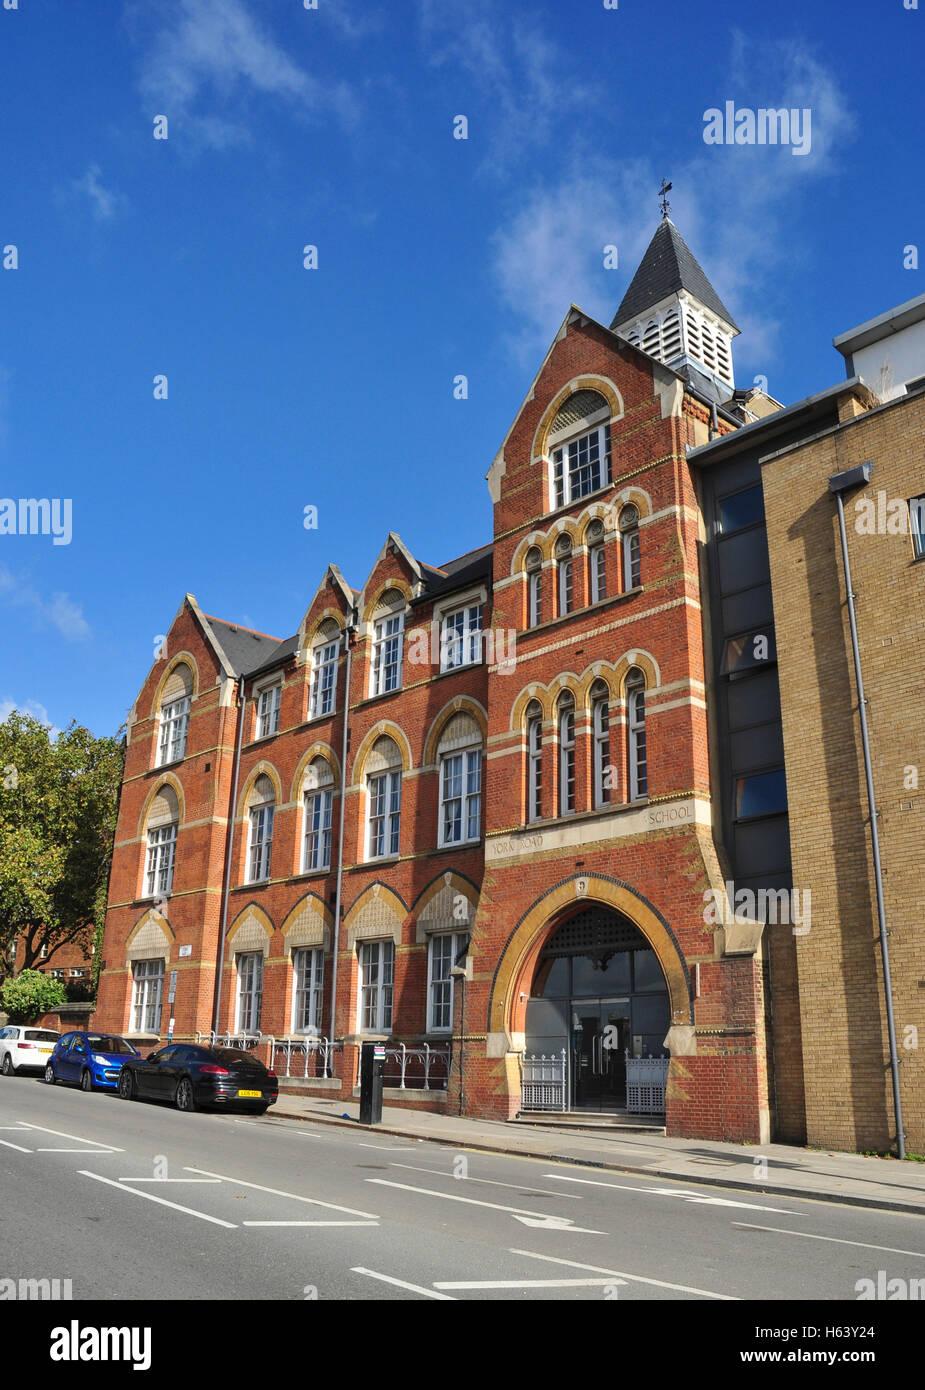 The old school building (formerly York Road School), York Way, King's Cross, London, England, UK - Stock Image